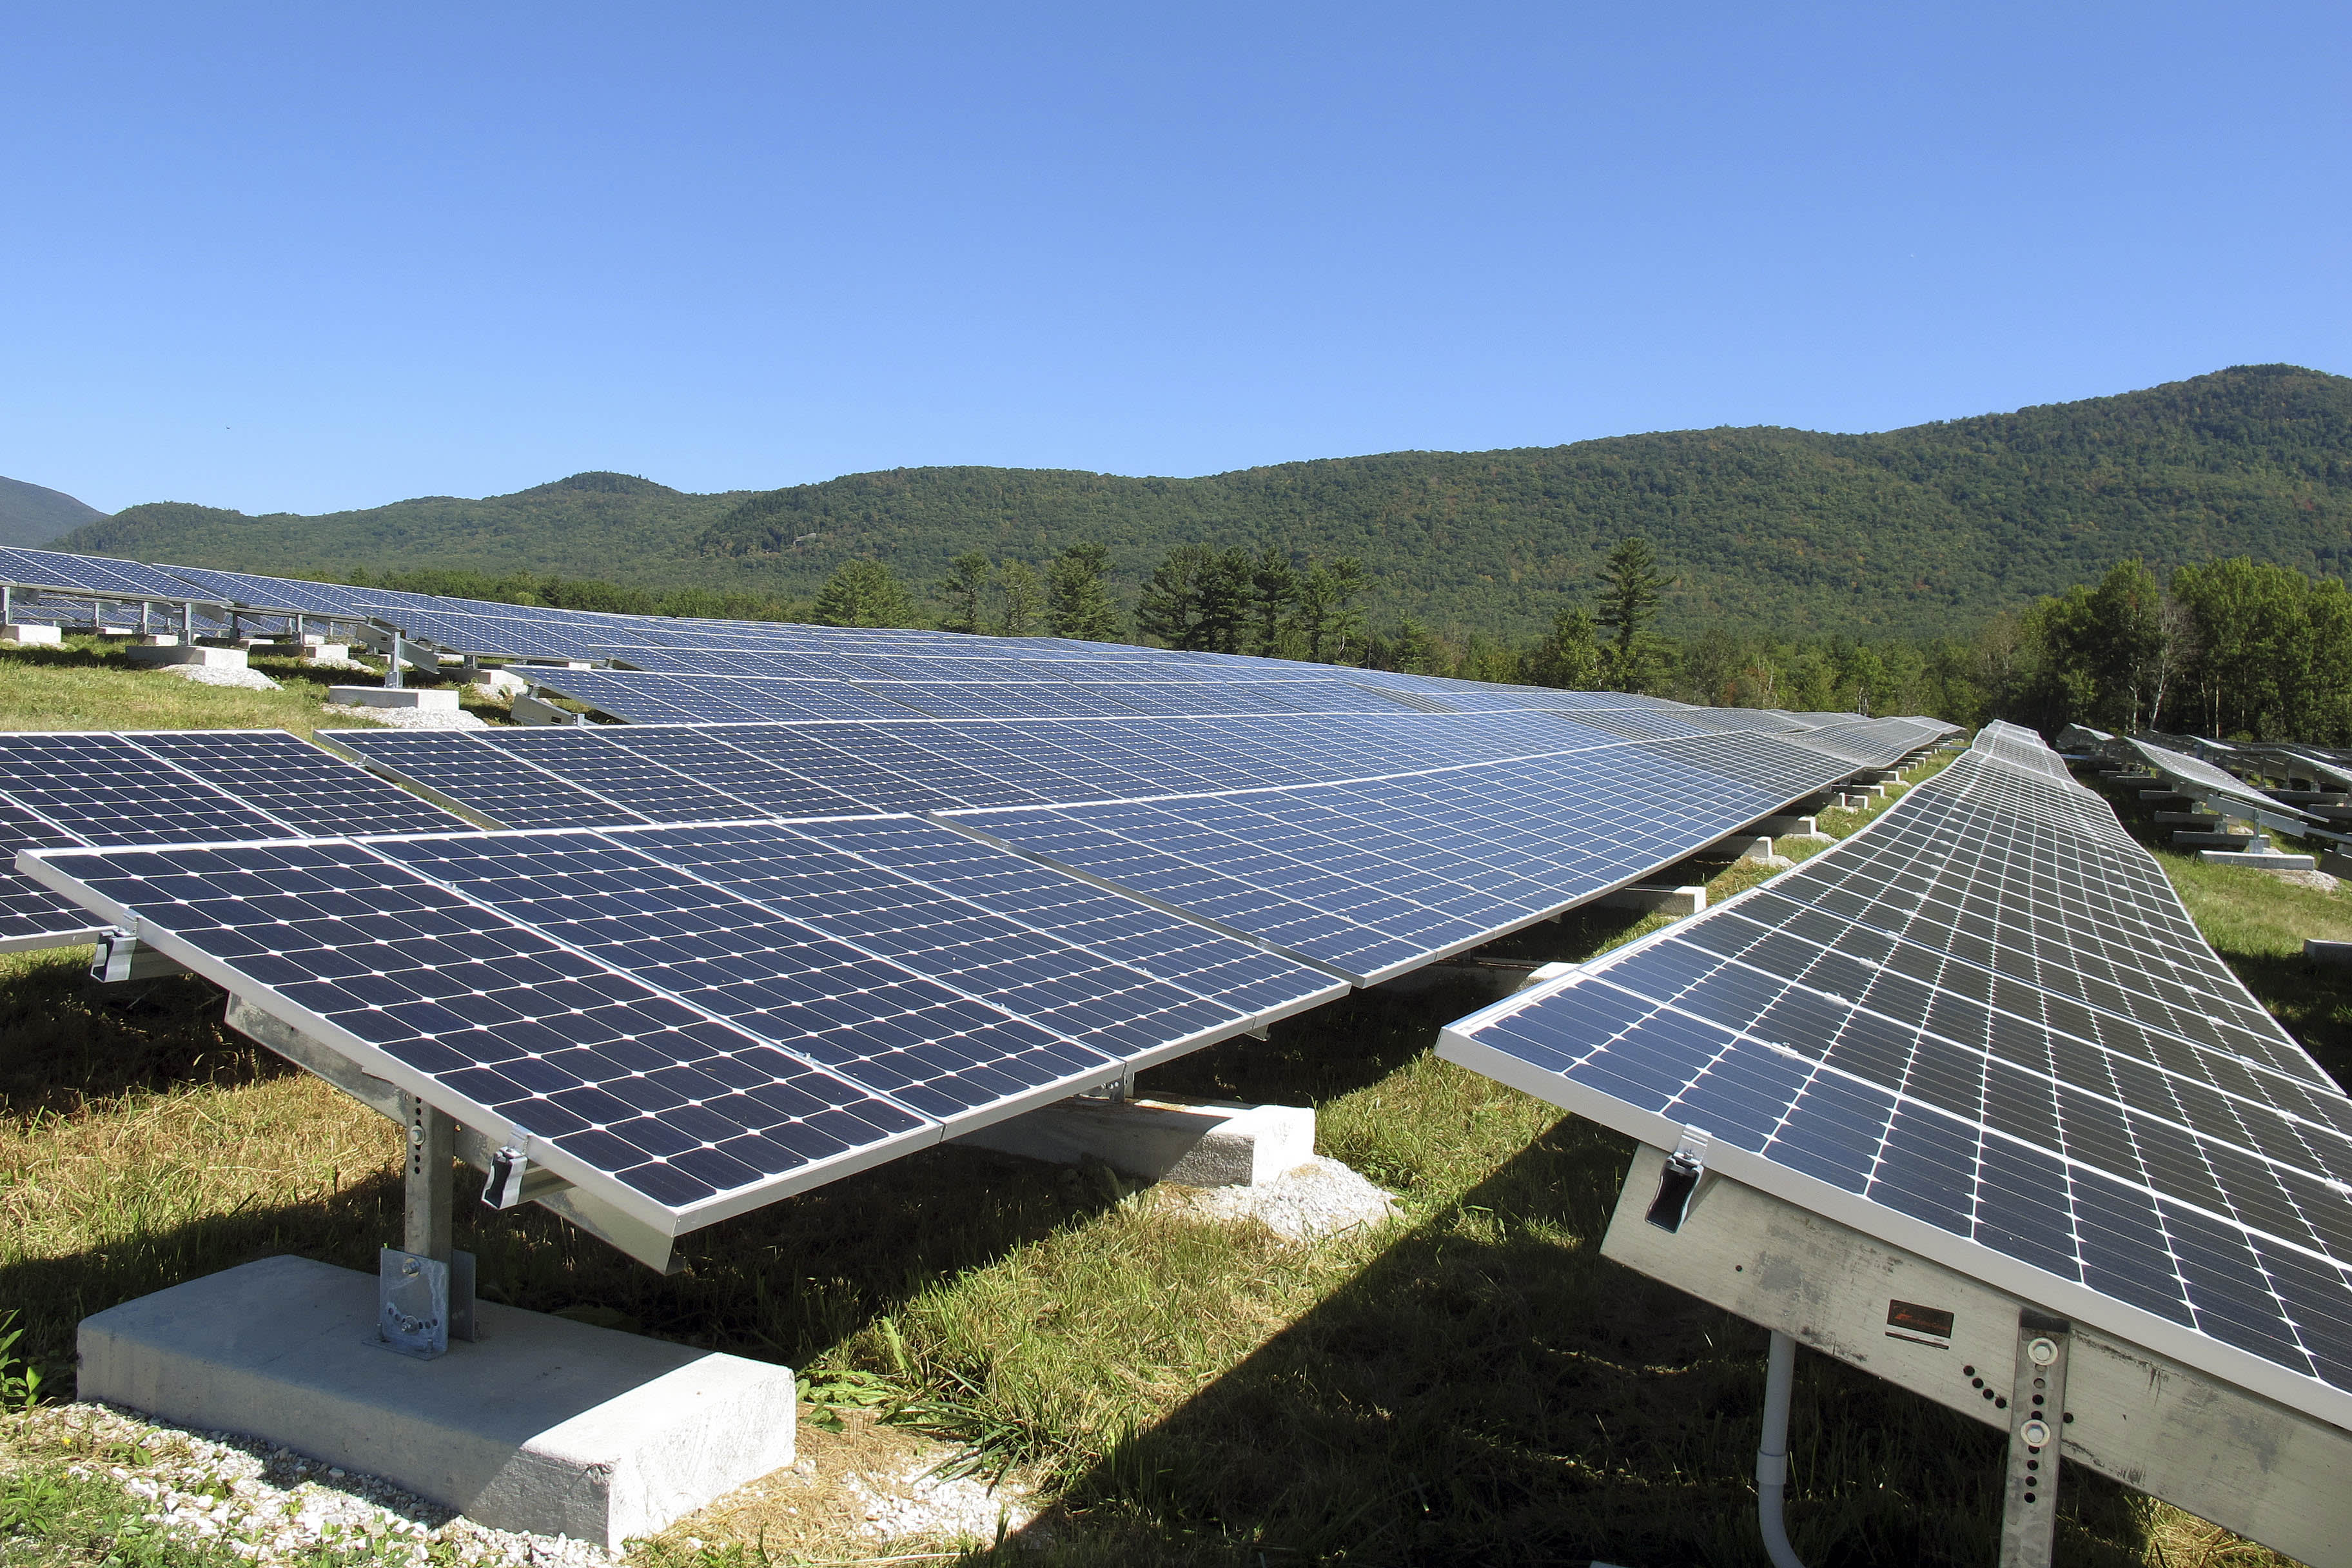 Google backs former DeepMind employee's 'solar forecasting' start-up